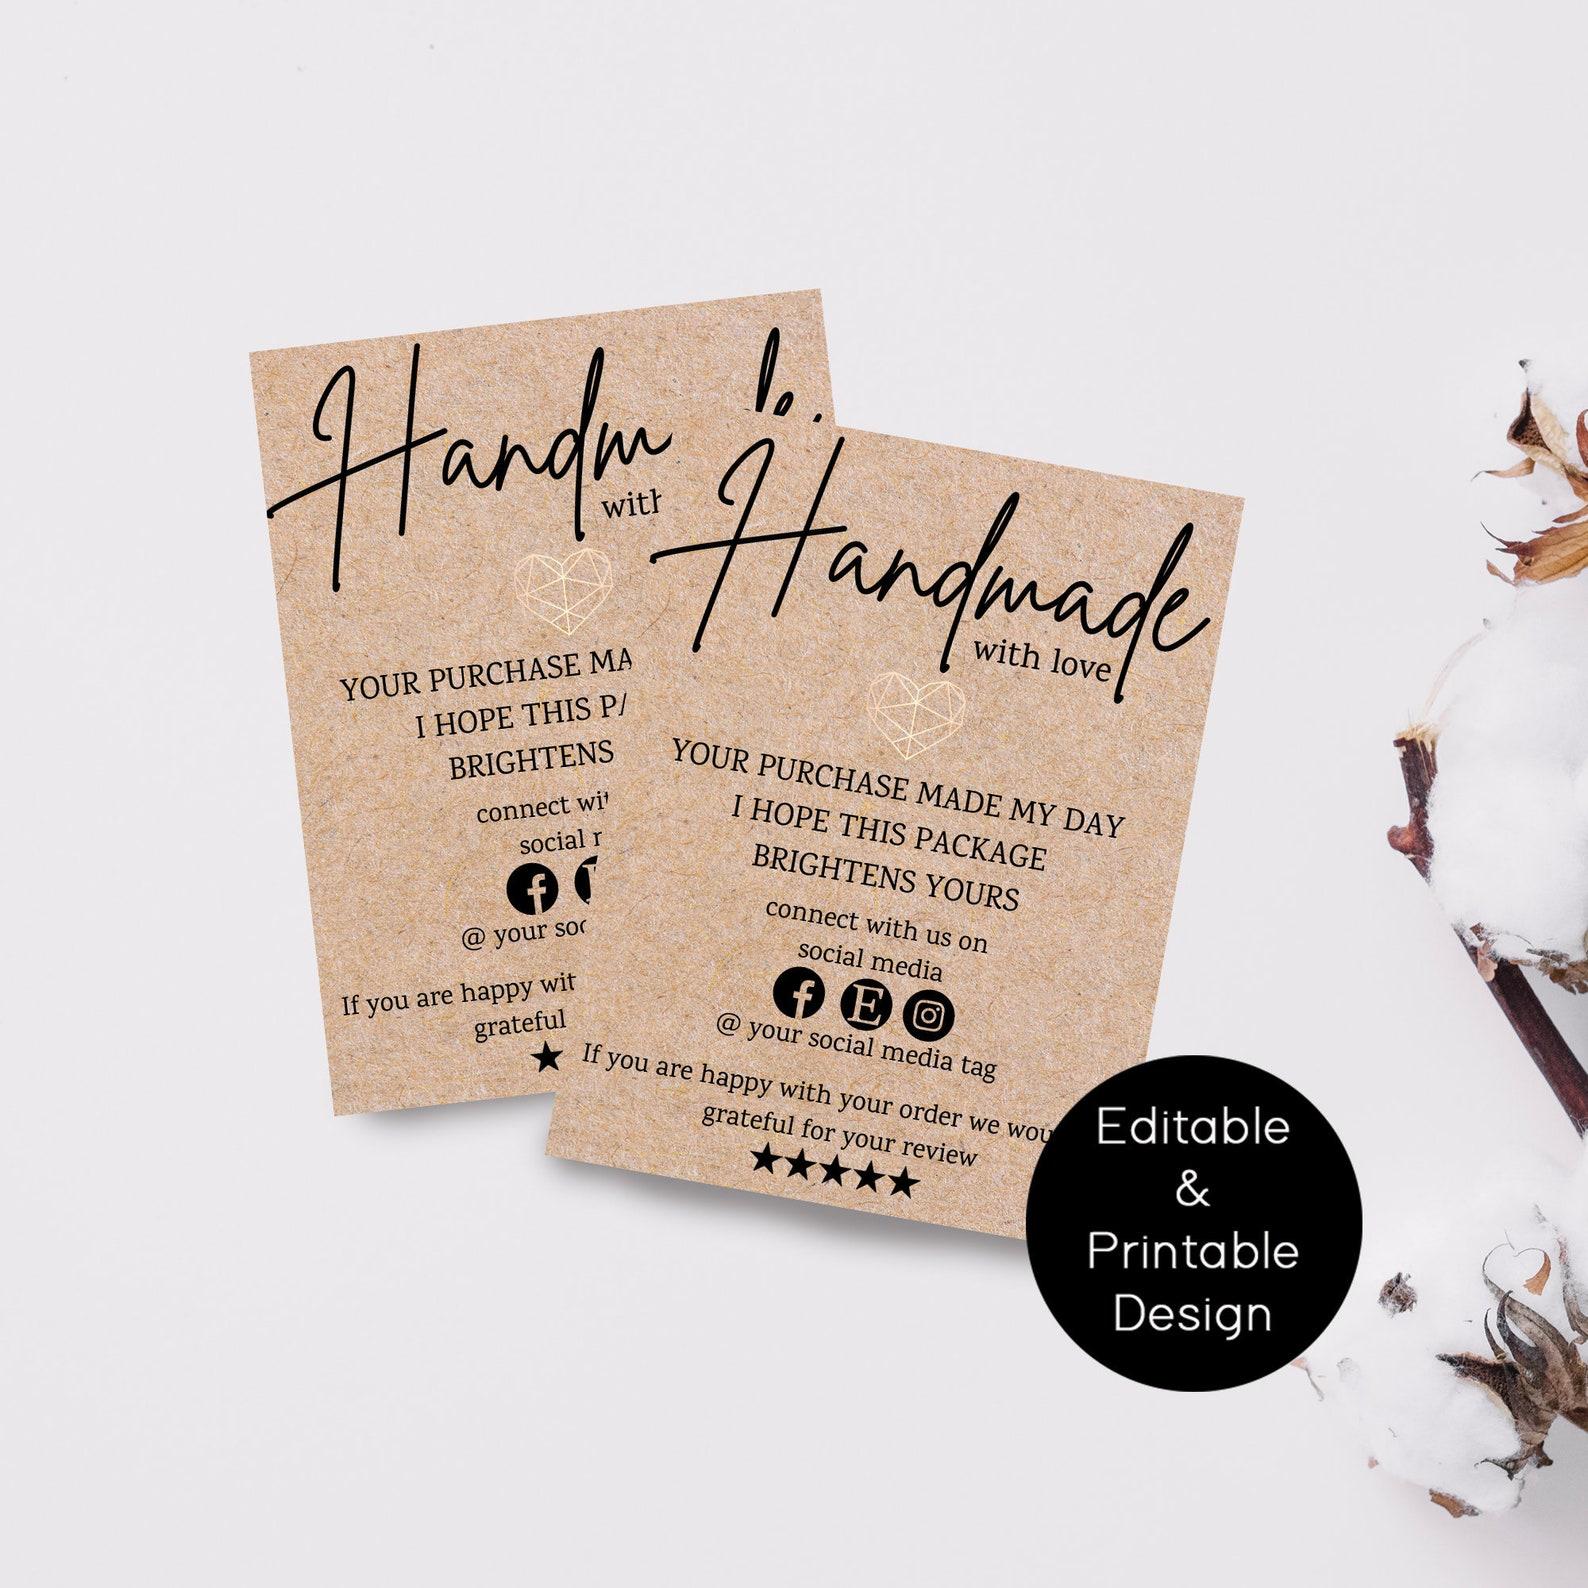 Handmade Printable Business Cards